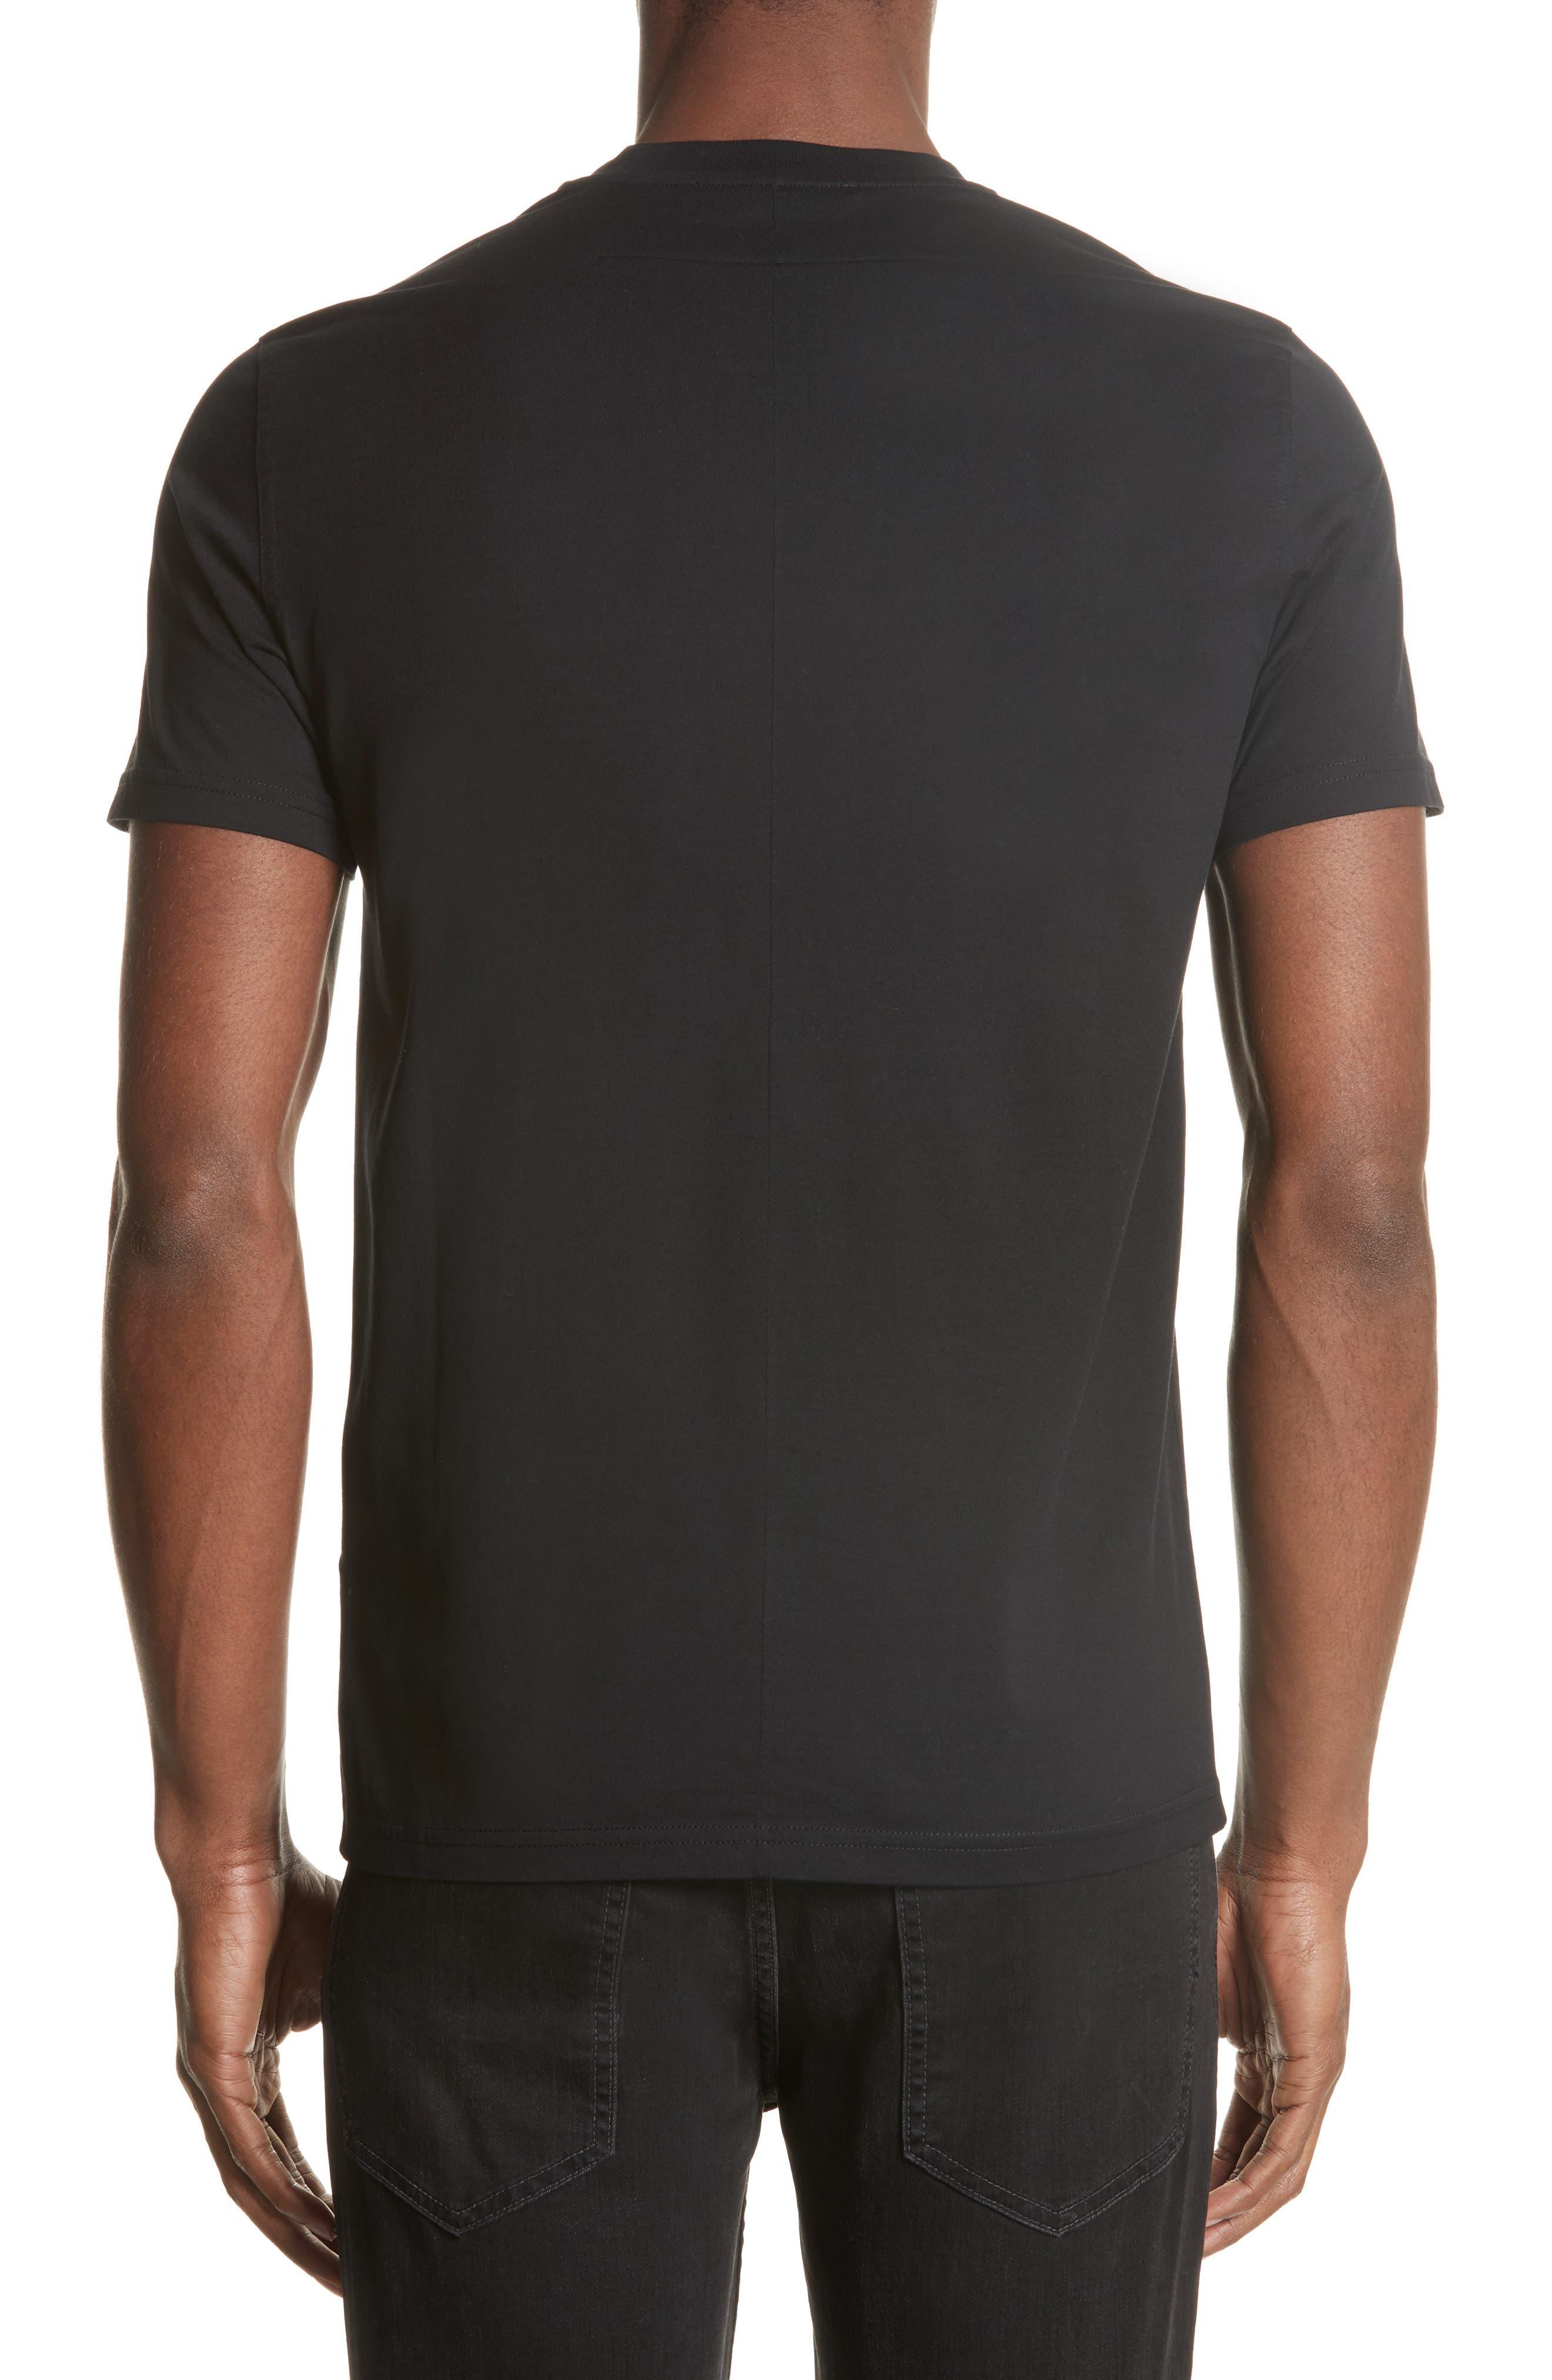 LA House Graphic T-Shirt,                             Alternate thumbnail 2, color,                             Black